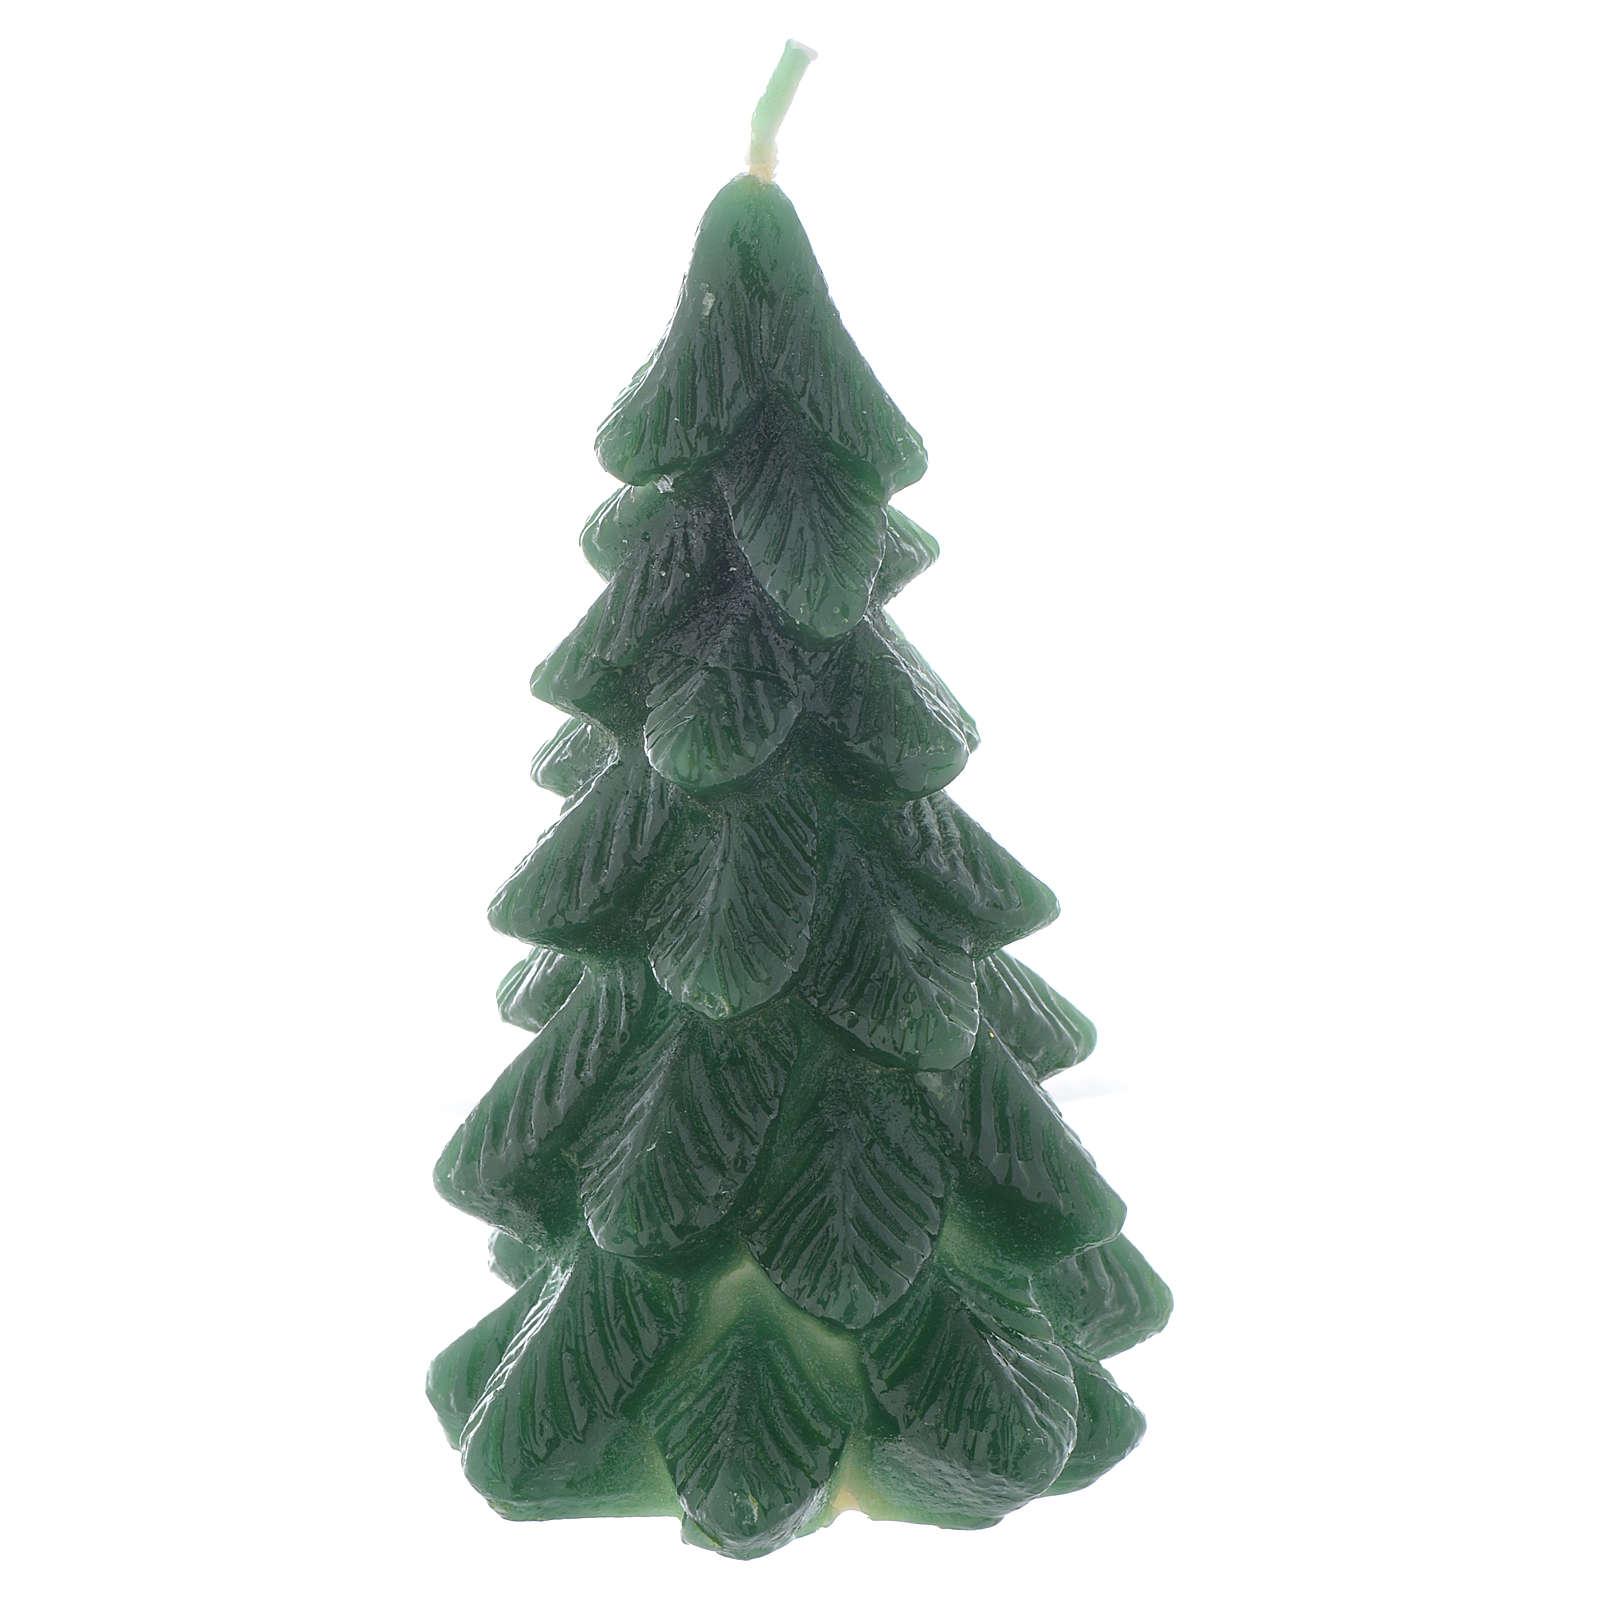 Bougie Sapin de Noël 11 cm vert 3